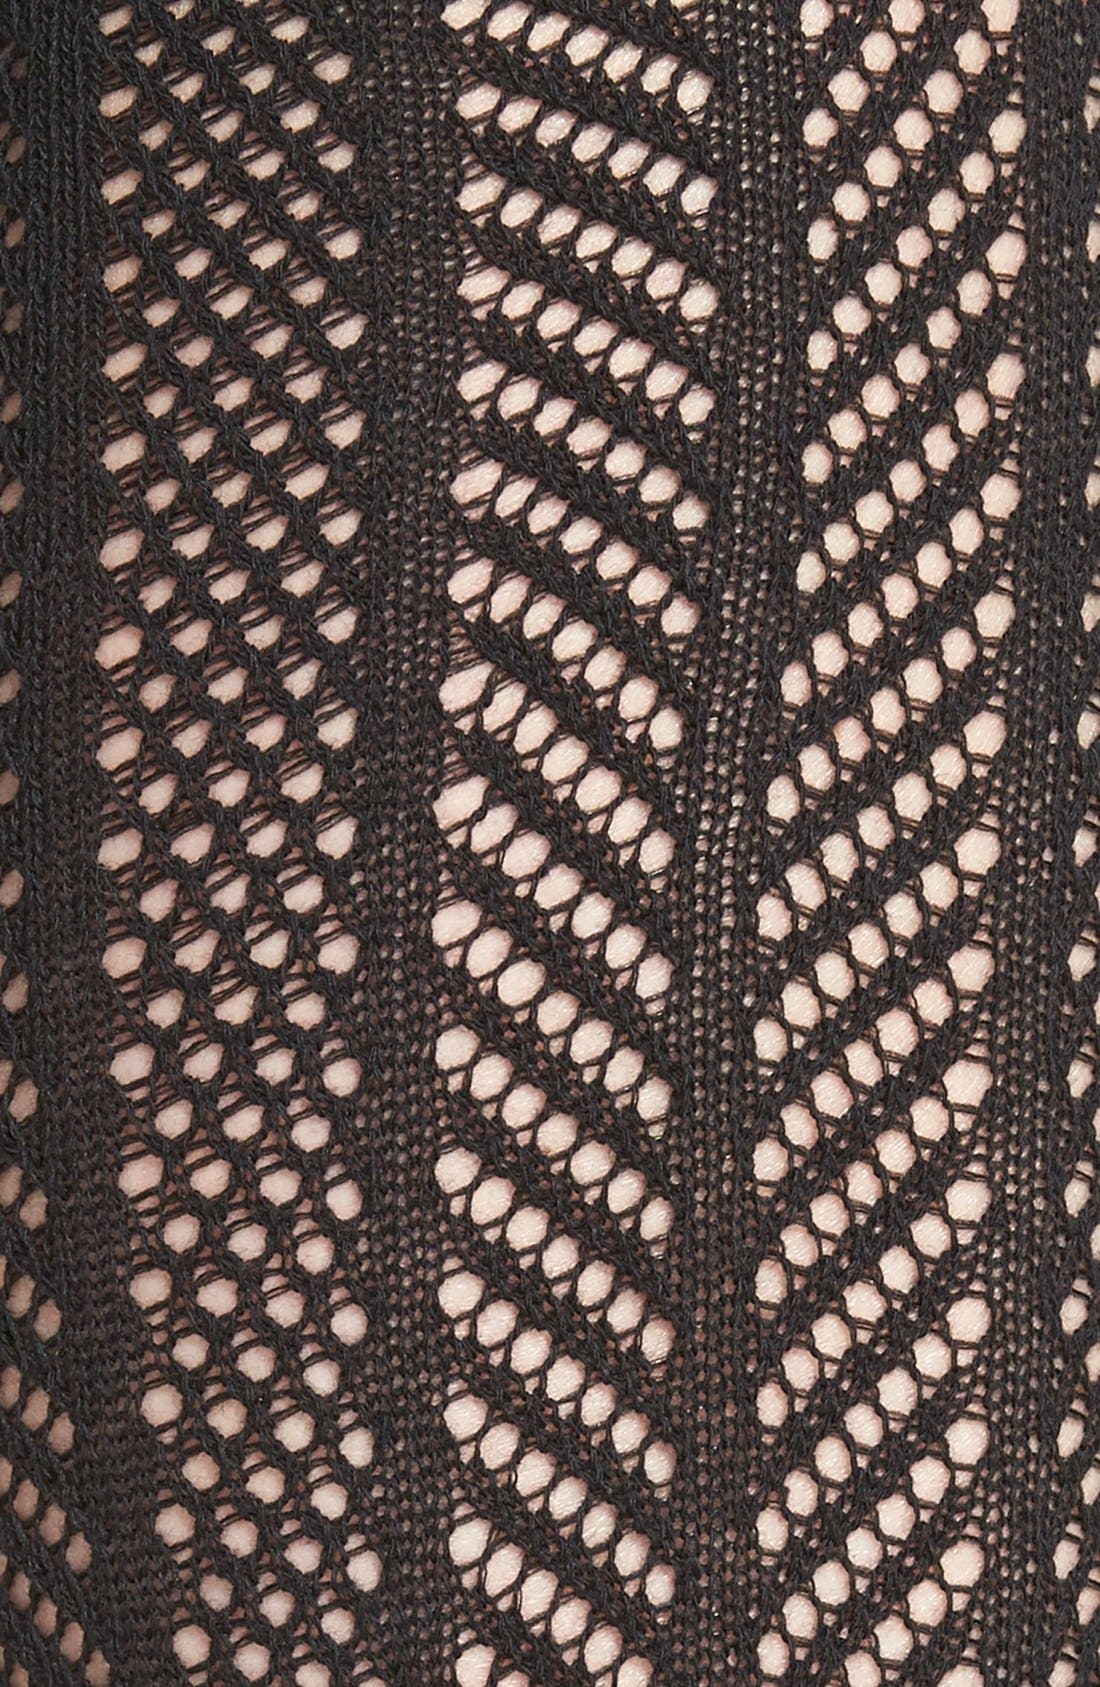 Openwork Knit Thigh High Socks,                             Alternate thumbnail 3, color,                             001